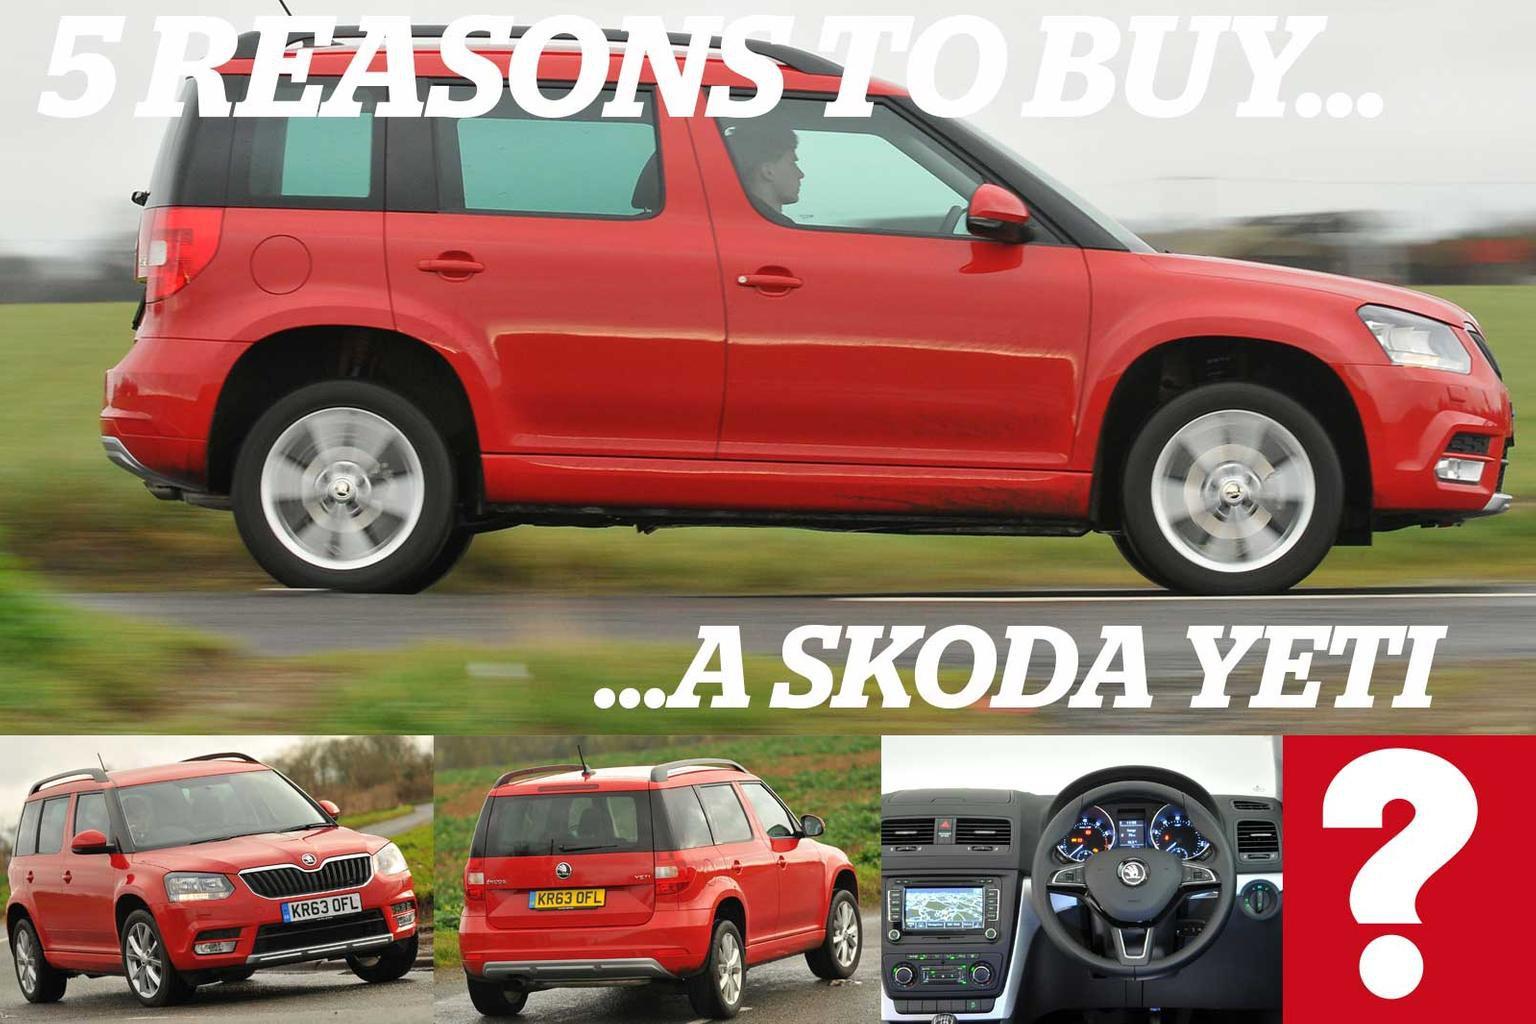 5 reasons to buy a Skoda Yeti